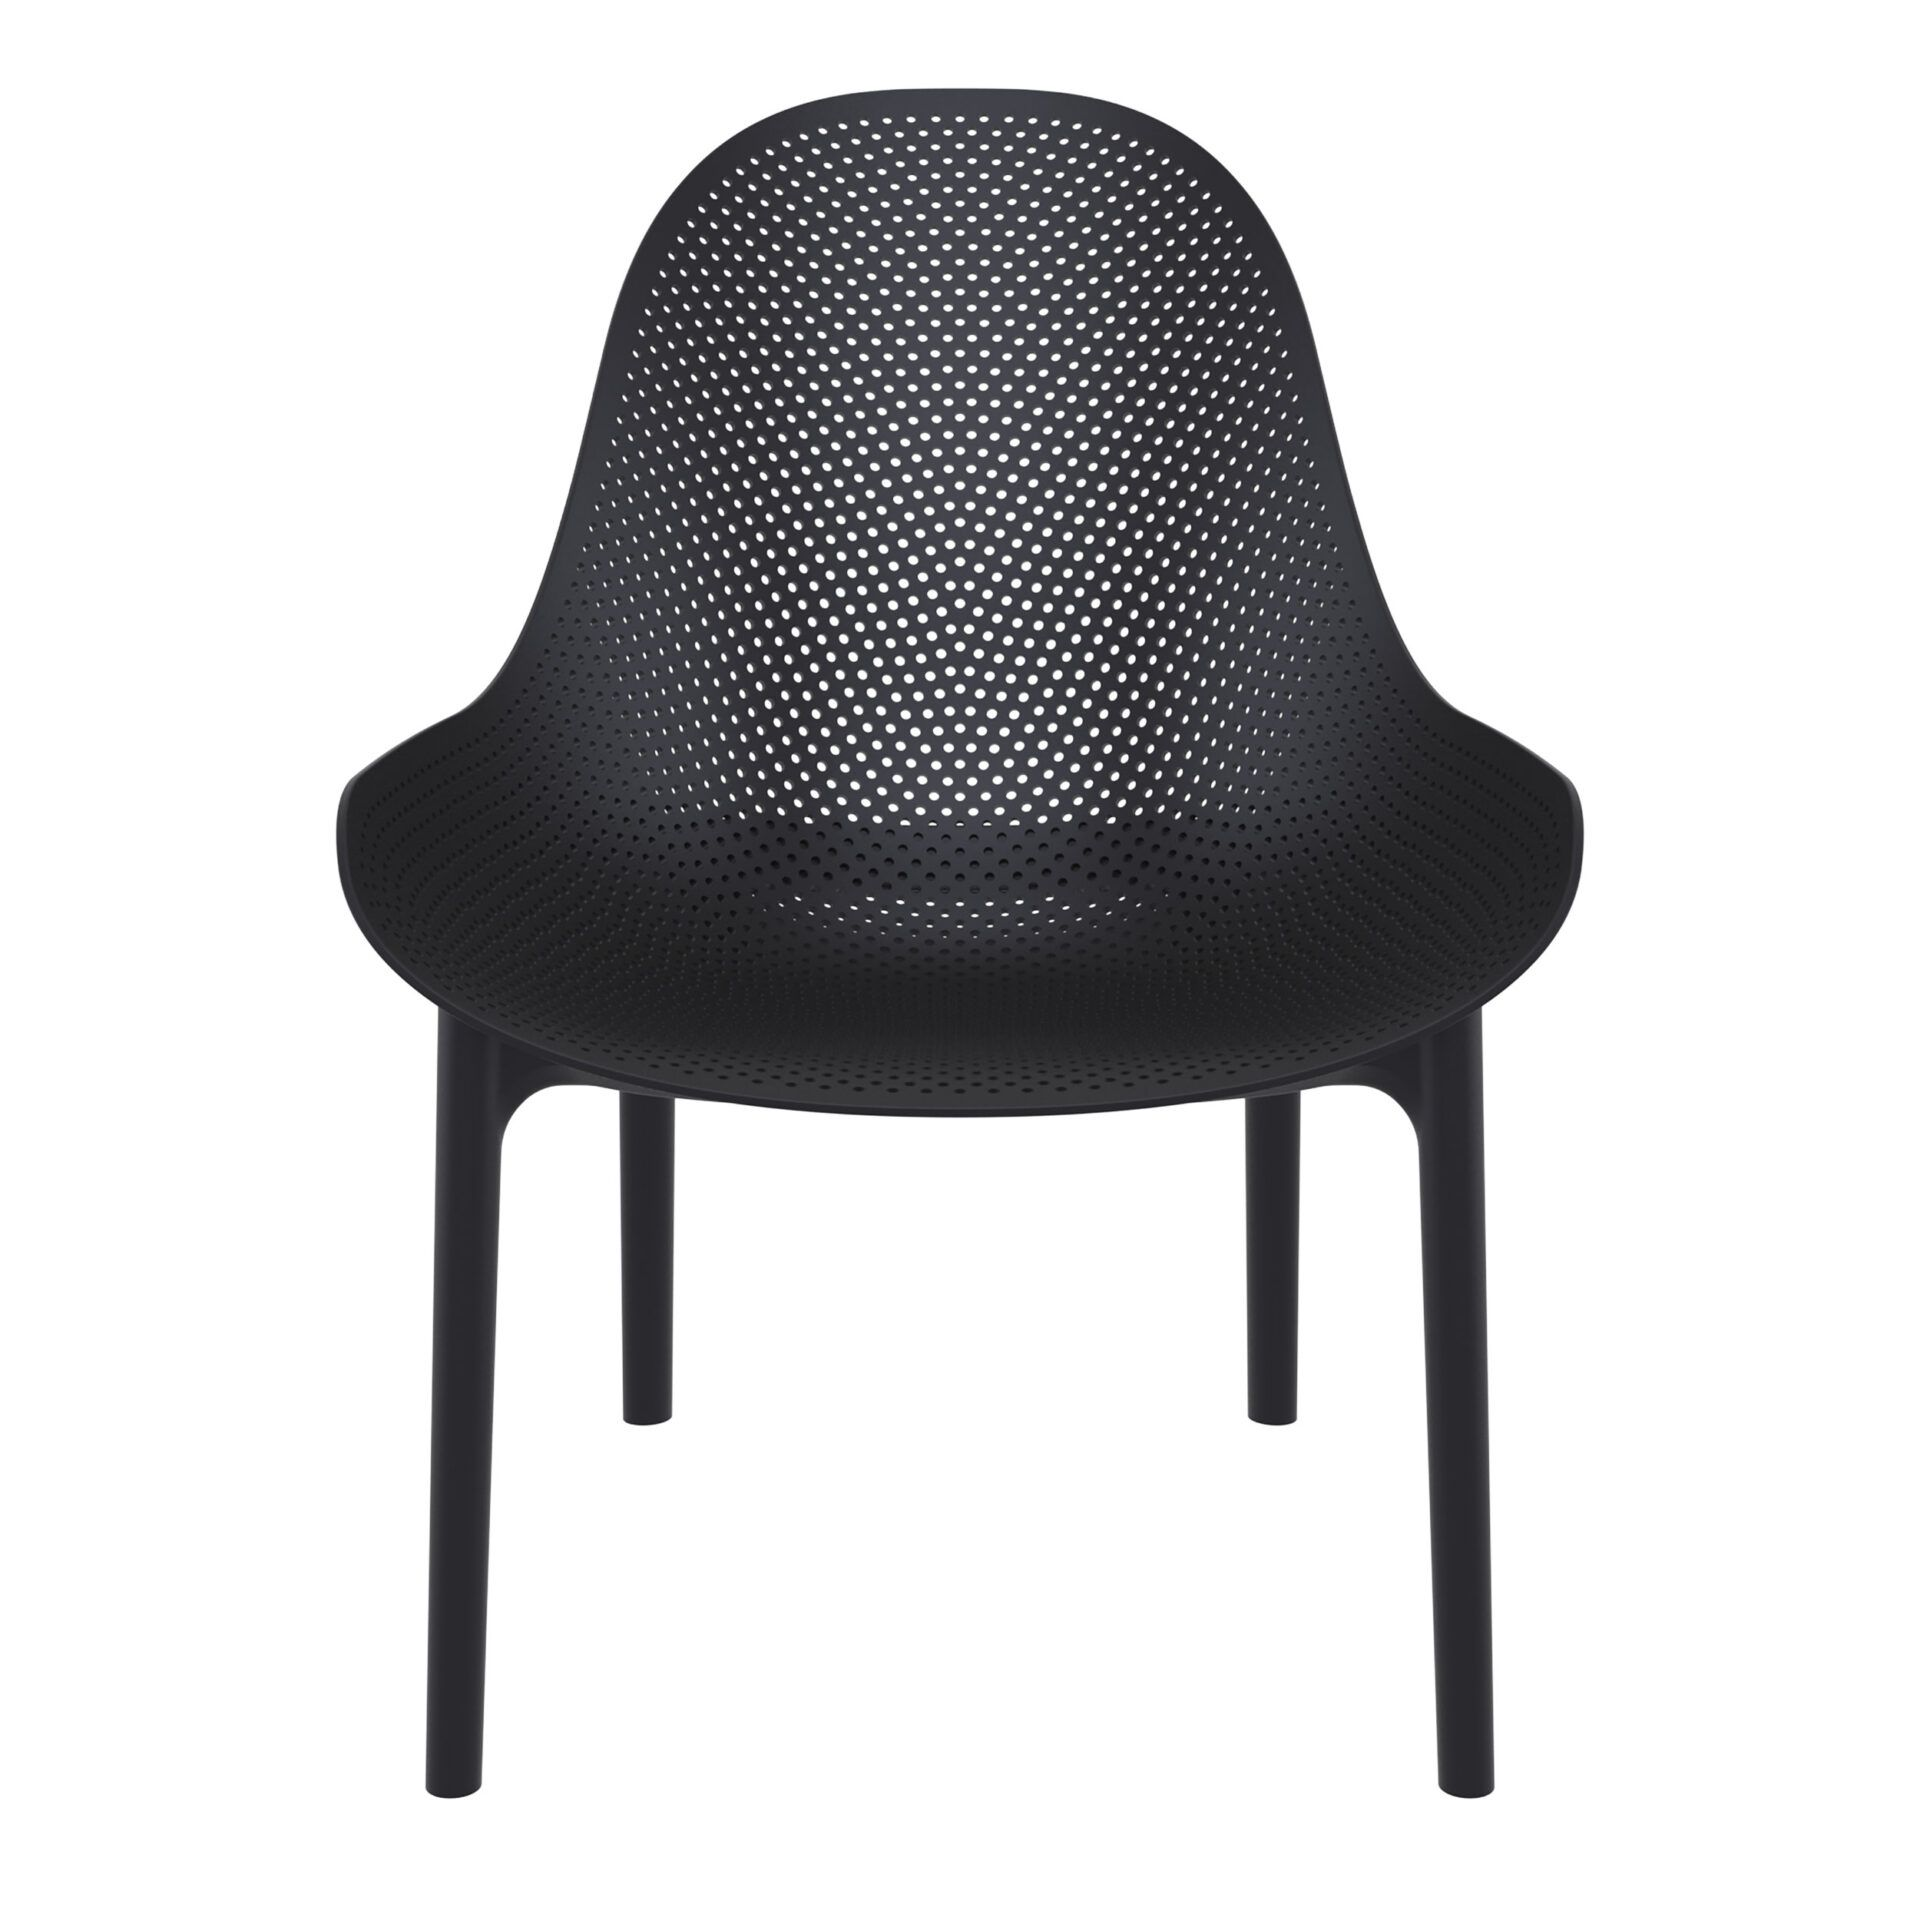 outdoor seating polypropylene sky lounge black front